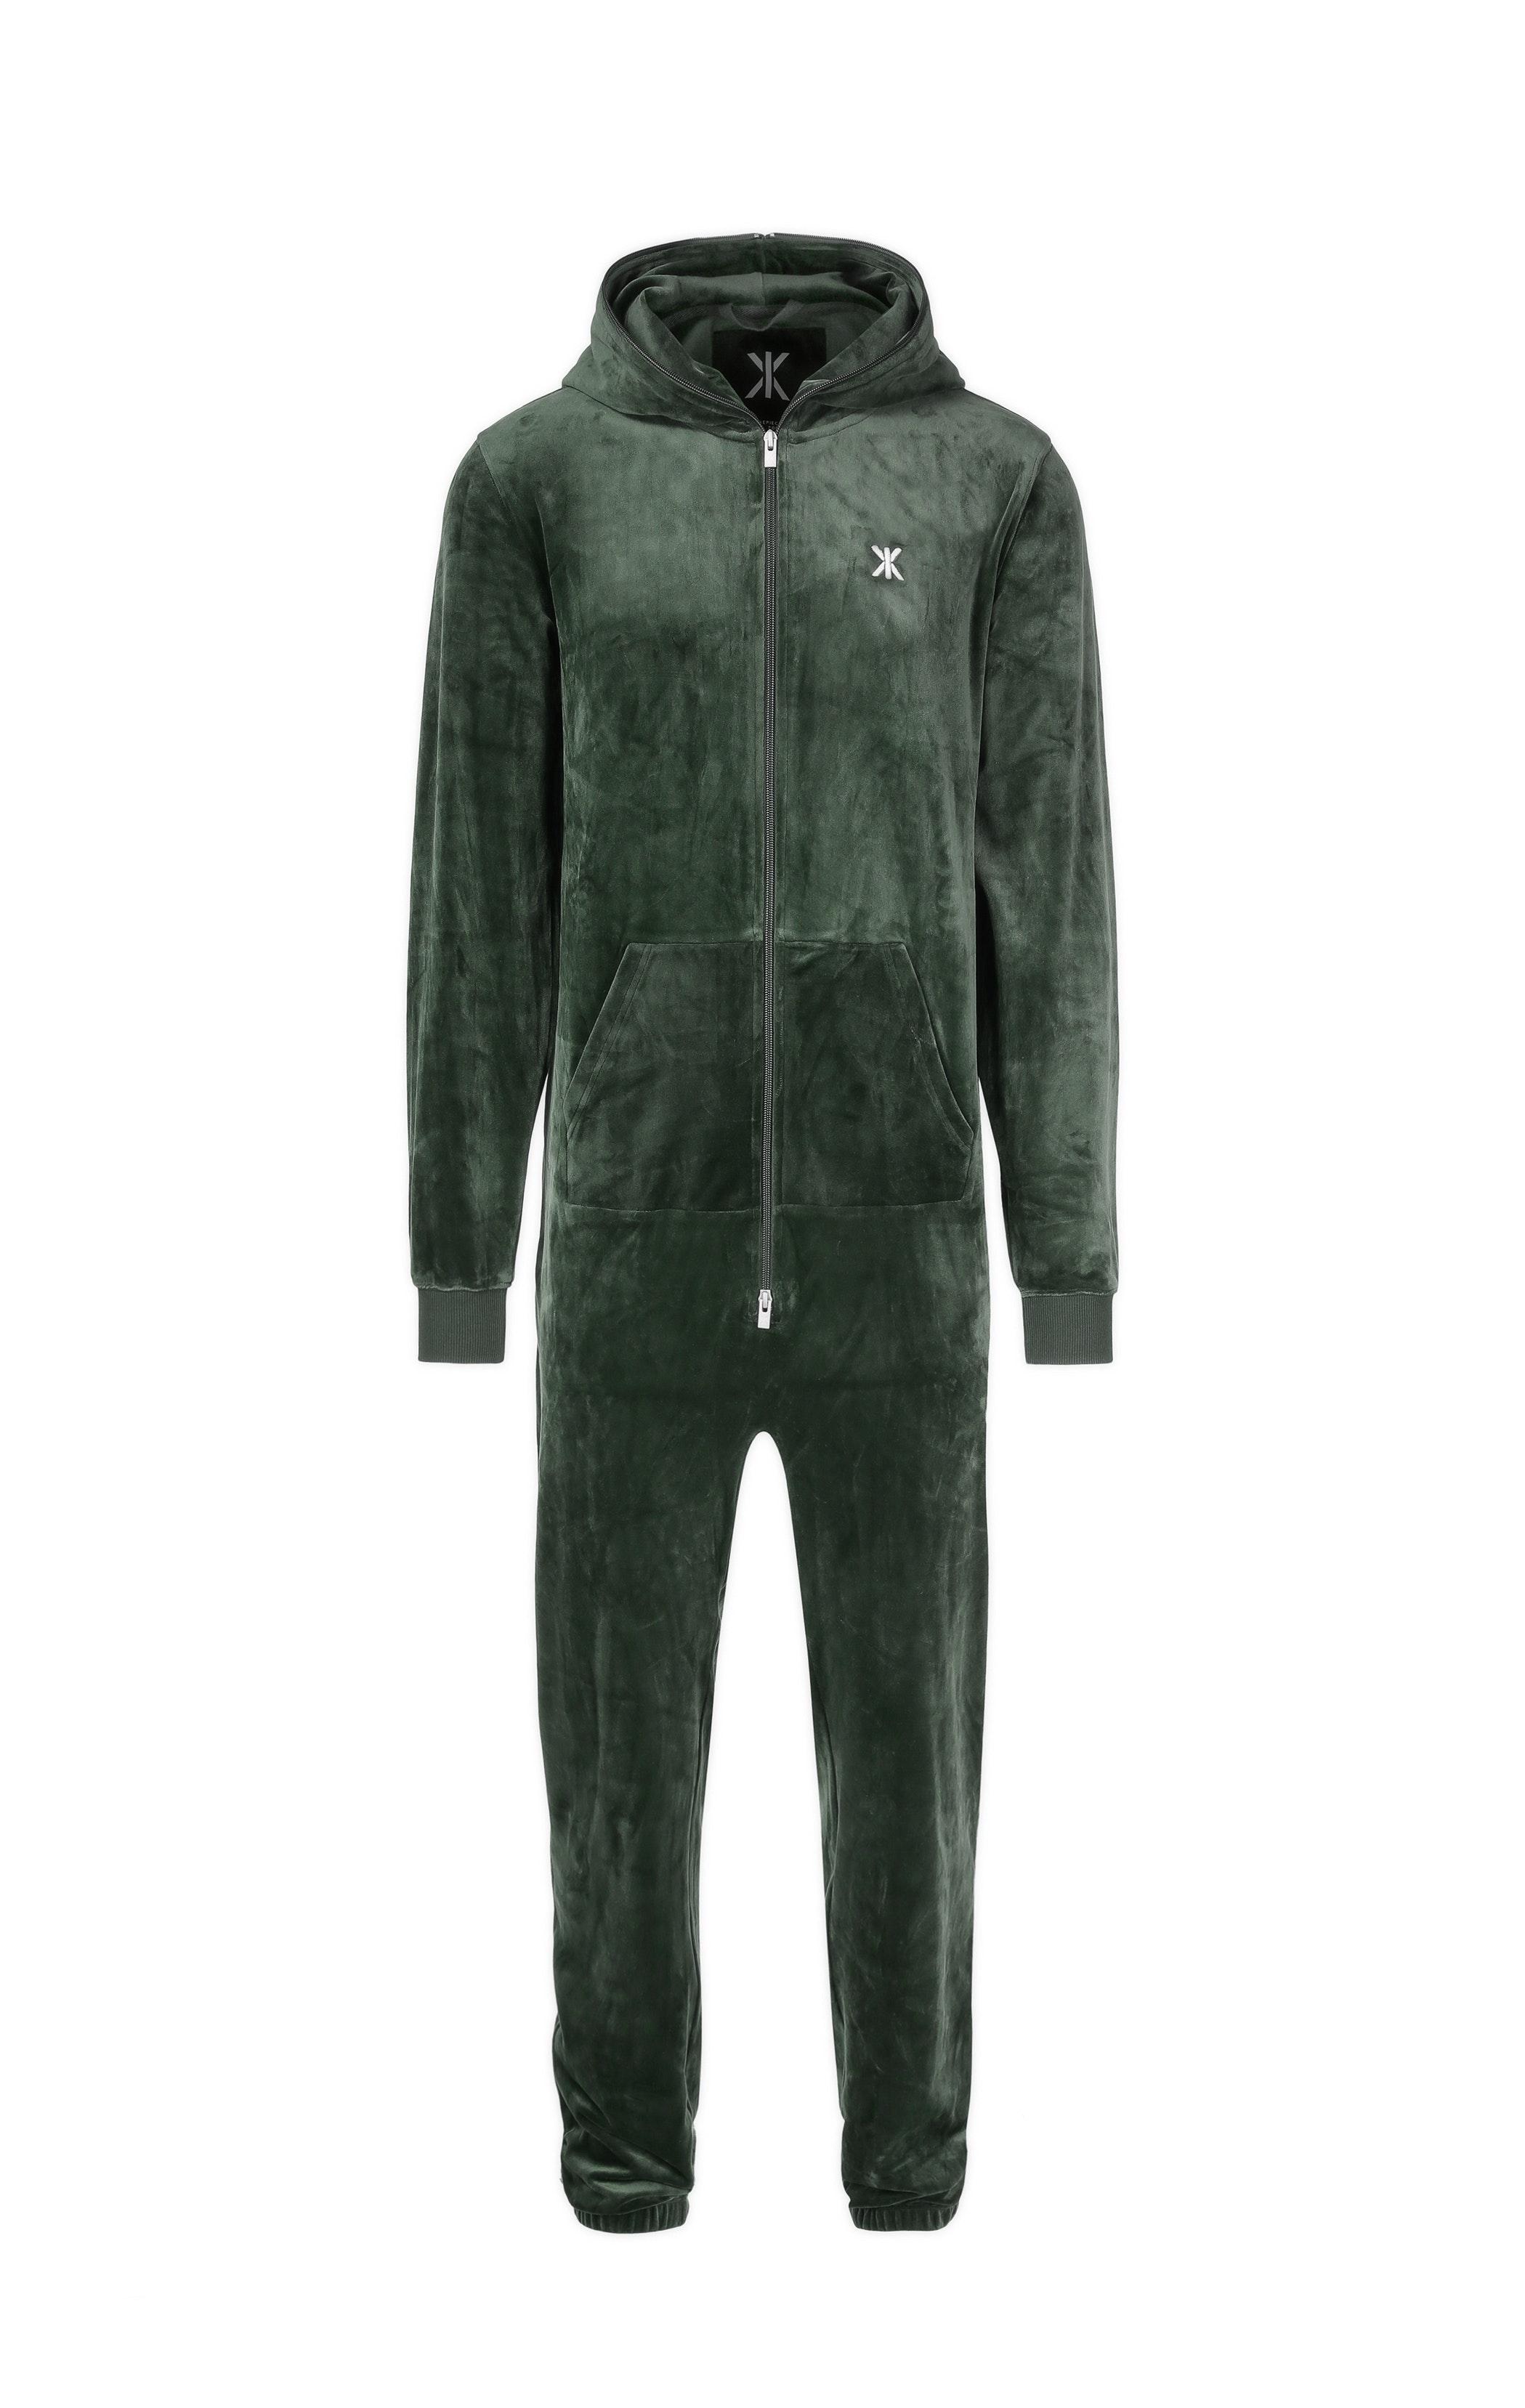 Original Velvet Jumpsuit Navy